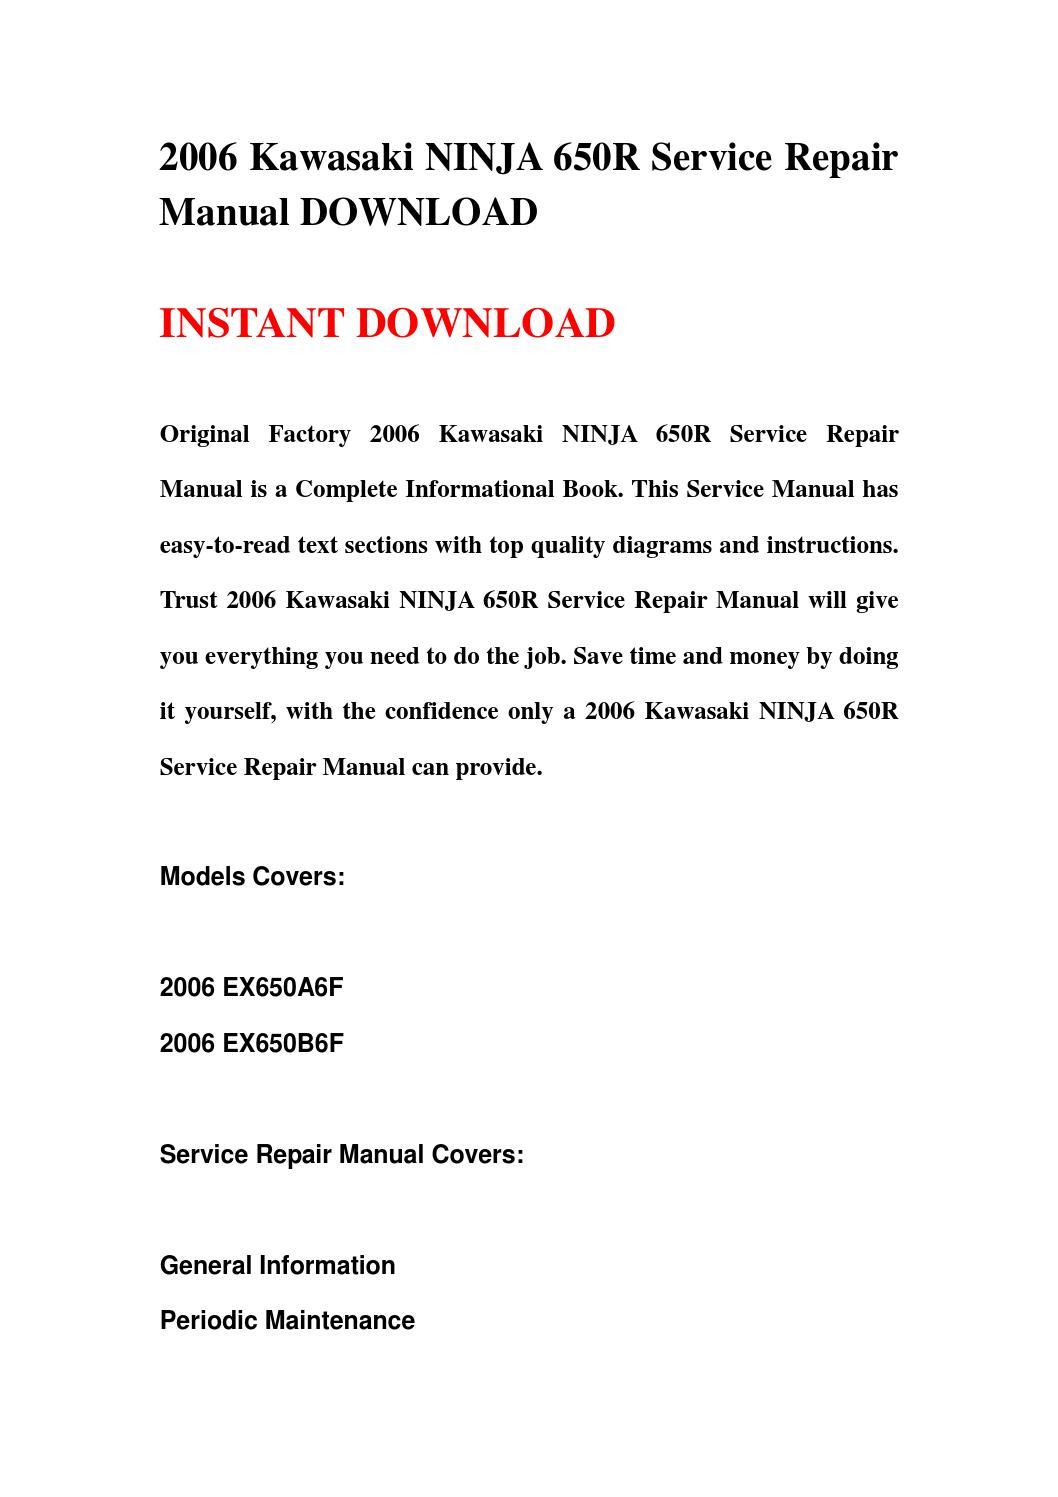 2006 Kawasaki Ninja 650r Service Repair Manual Download By Hsgefbhe